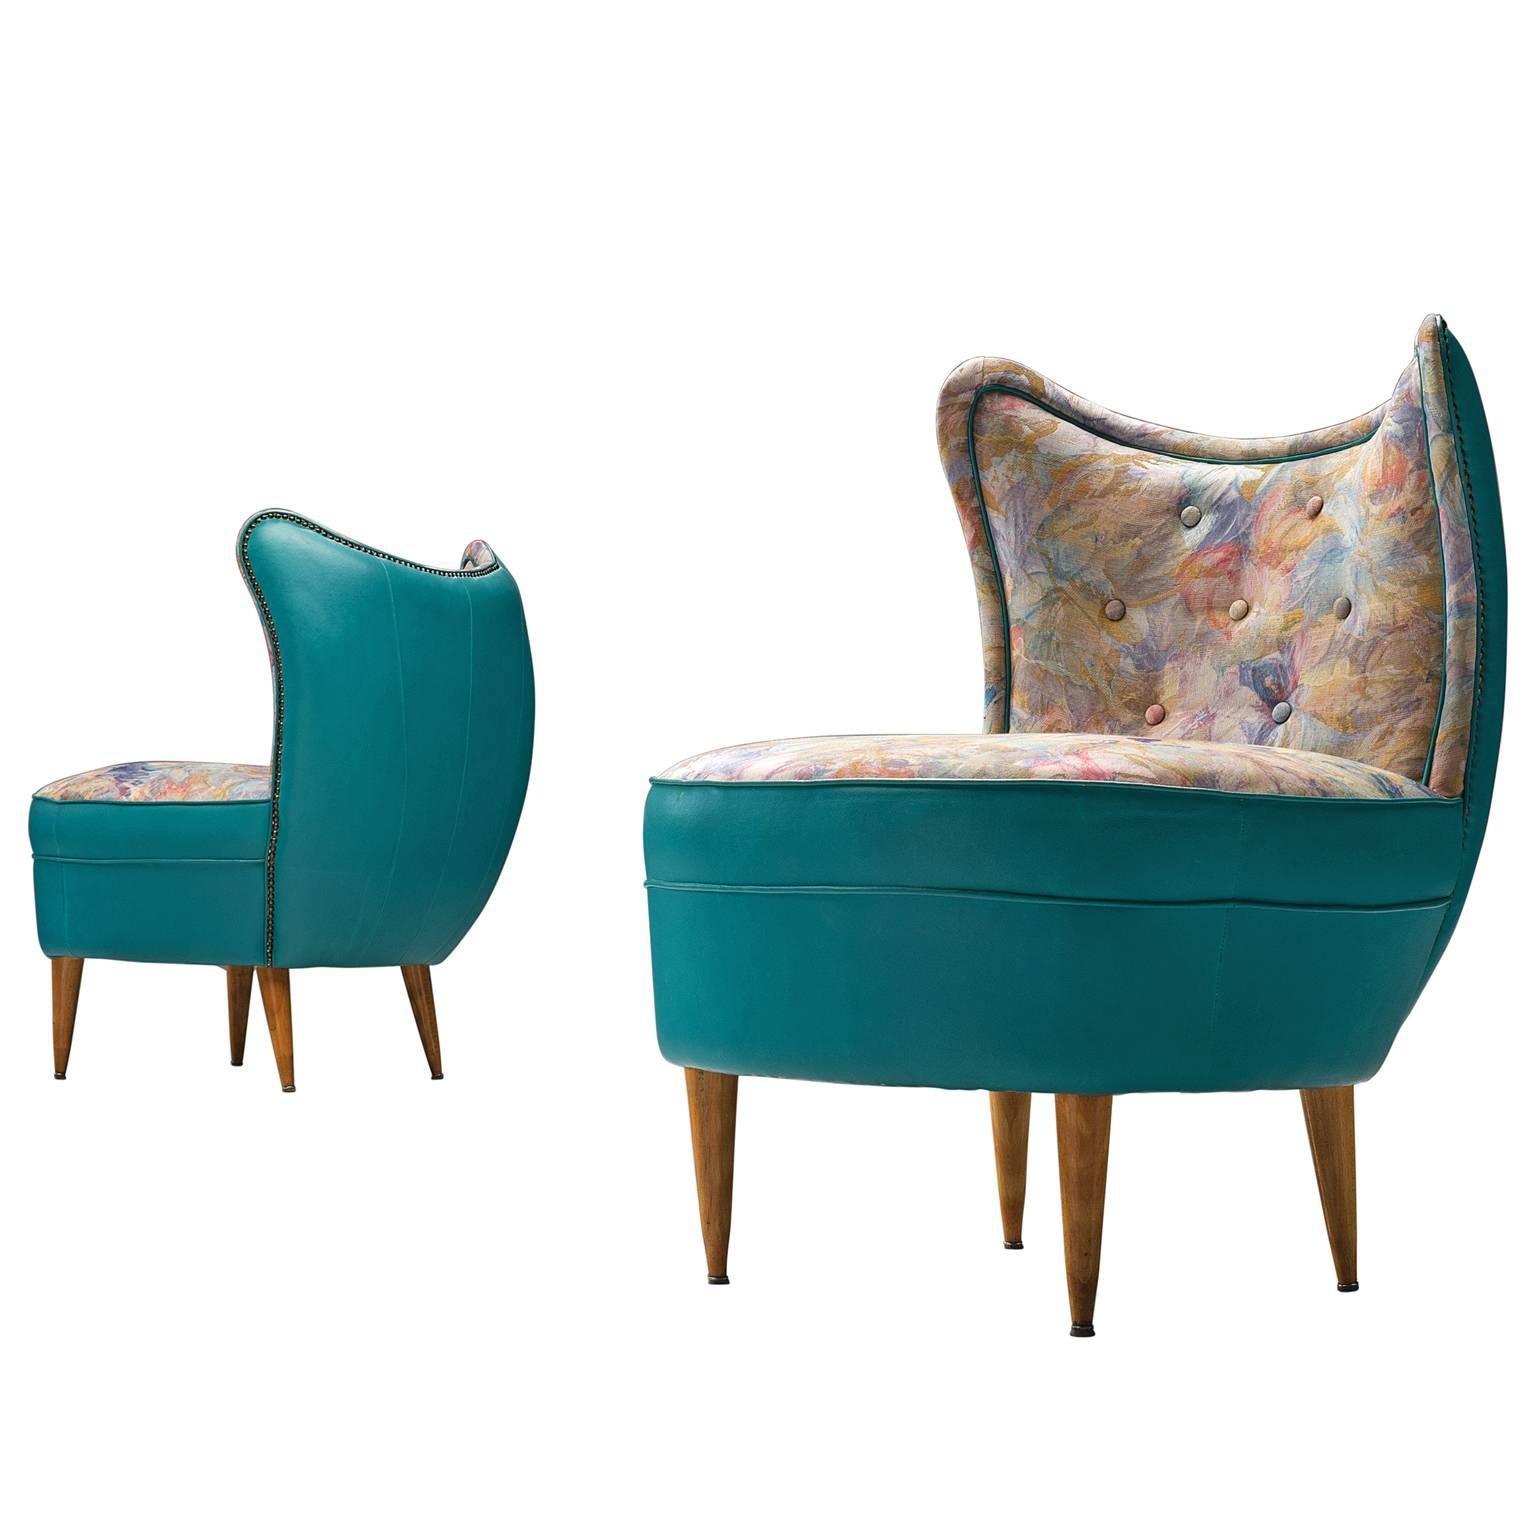 Josef Frank Pair Of U0027Liljevalchsu0027 Lounge Chairs For Sale At 1stdibs Photo